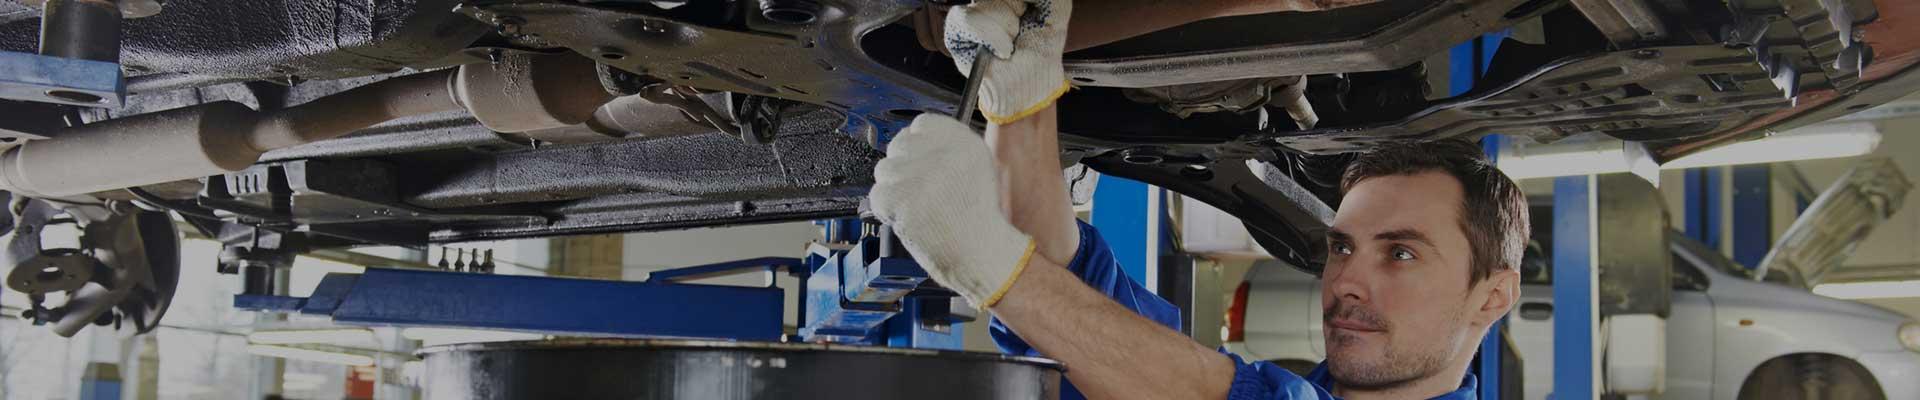 Baker's Body Center Inc. reviews | Auto Repair at 5741 US-220 BUS - Bedford PA